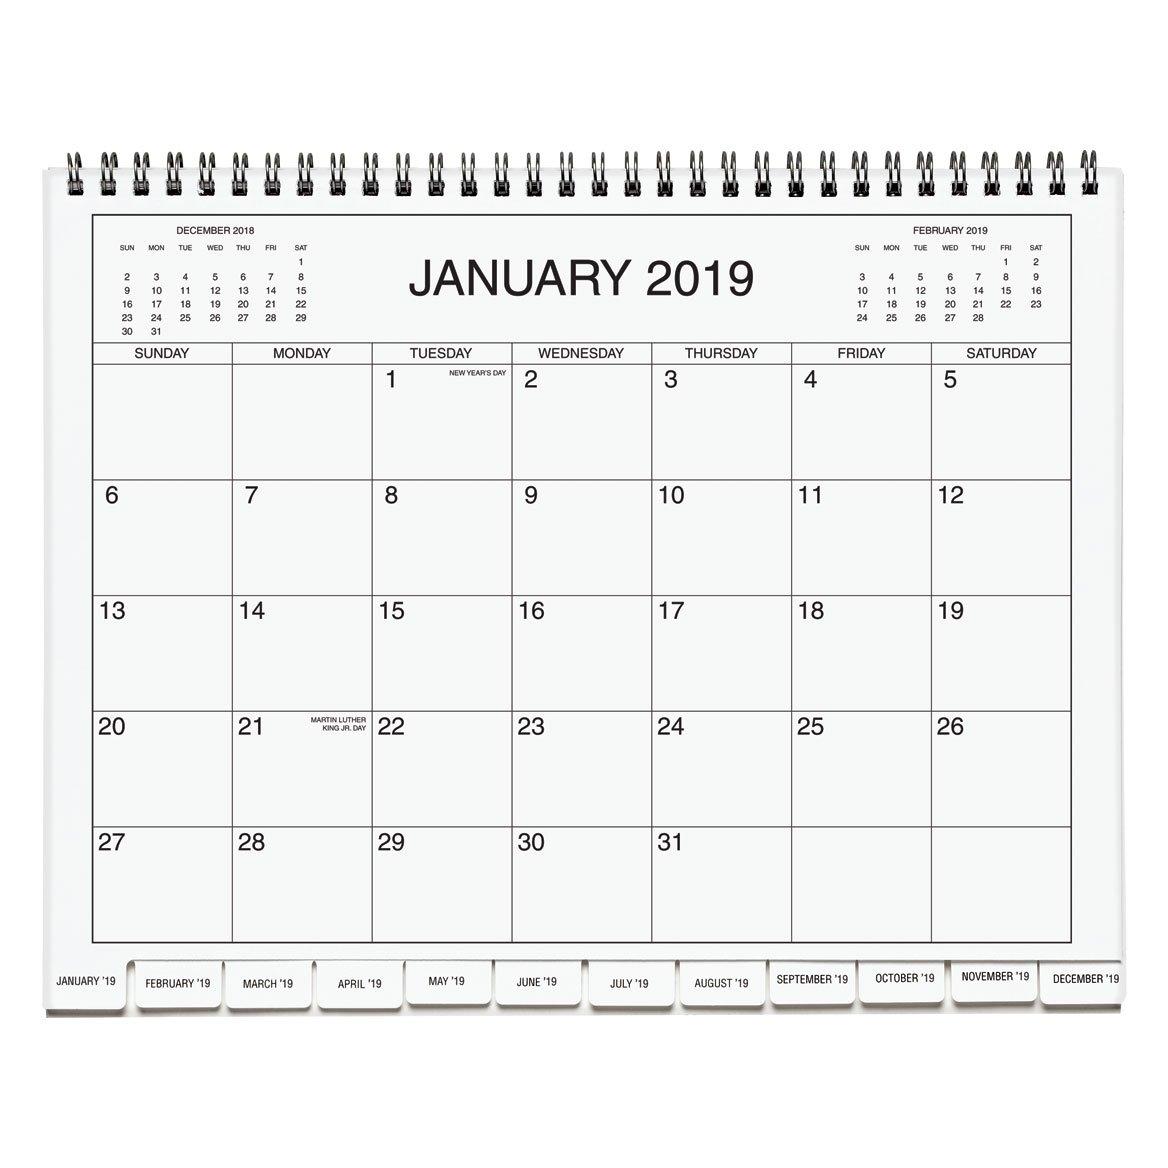 3 Year Calendar 2019 2021 – Three Year Calendar – Miles Kimball 3 Year Calendar 2019 To 2021